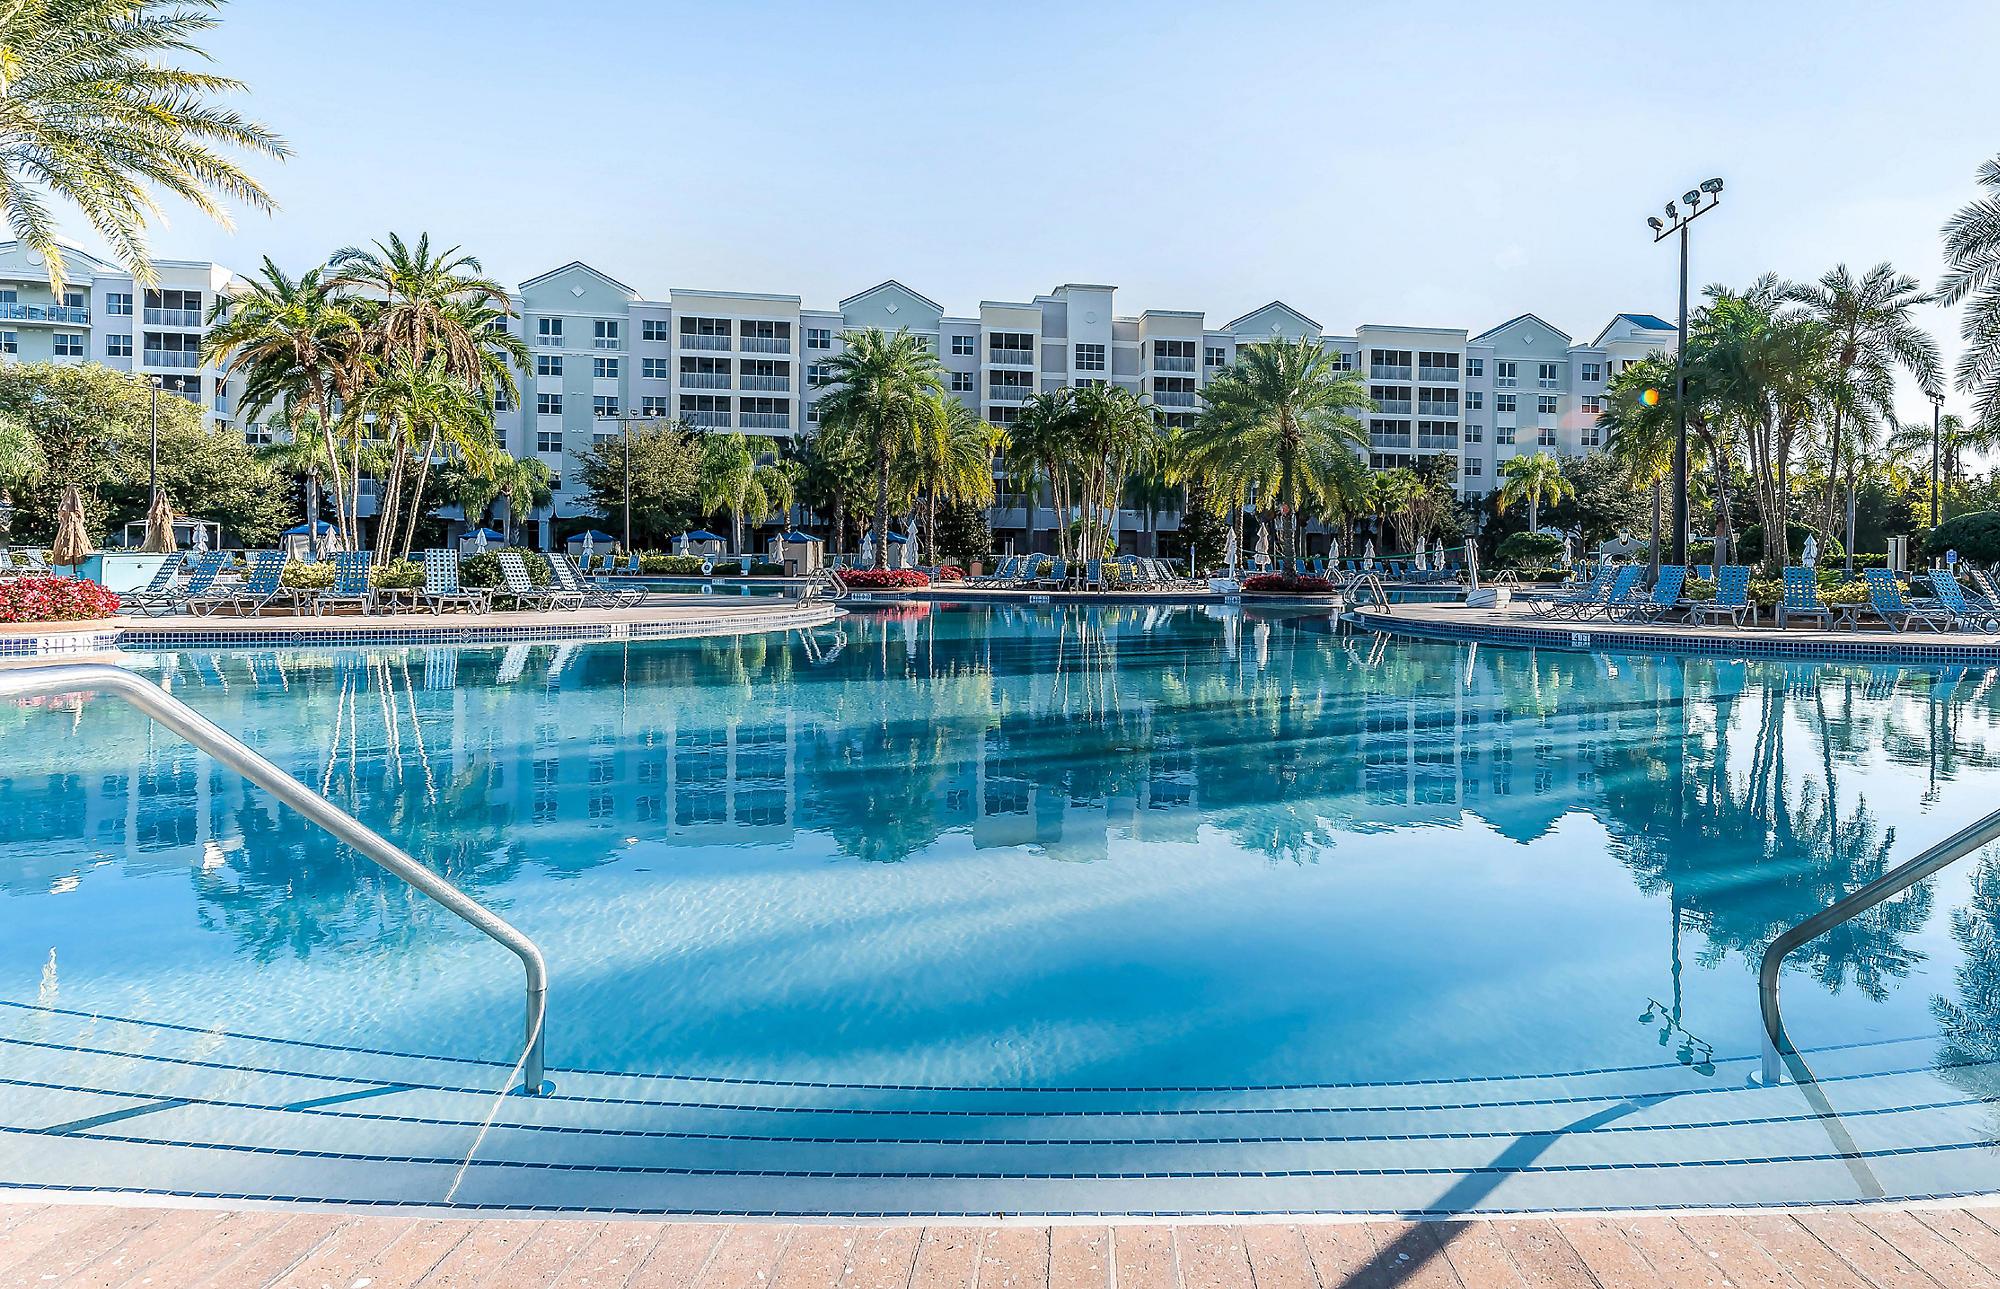 The Fountains Resort Orlando Florida Bluegreen Vacations